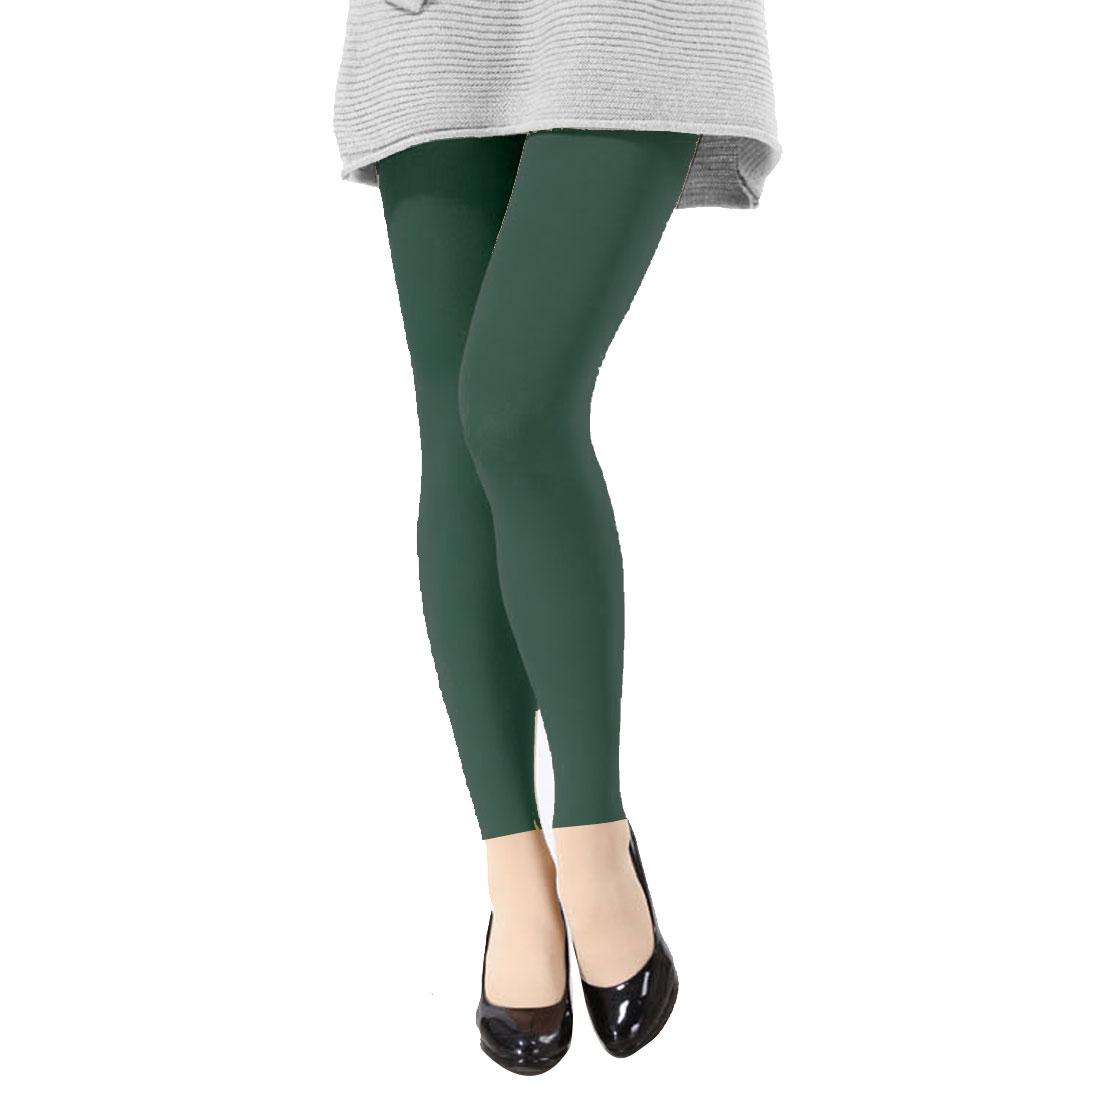 Ladies Slim Fit Stretchy Winter Leggings Stirrup Pantyhose Pants Dark Green XS